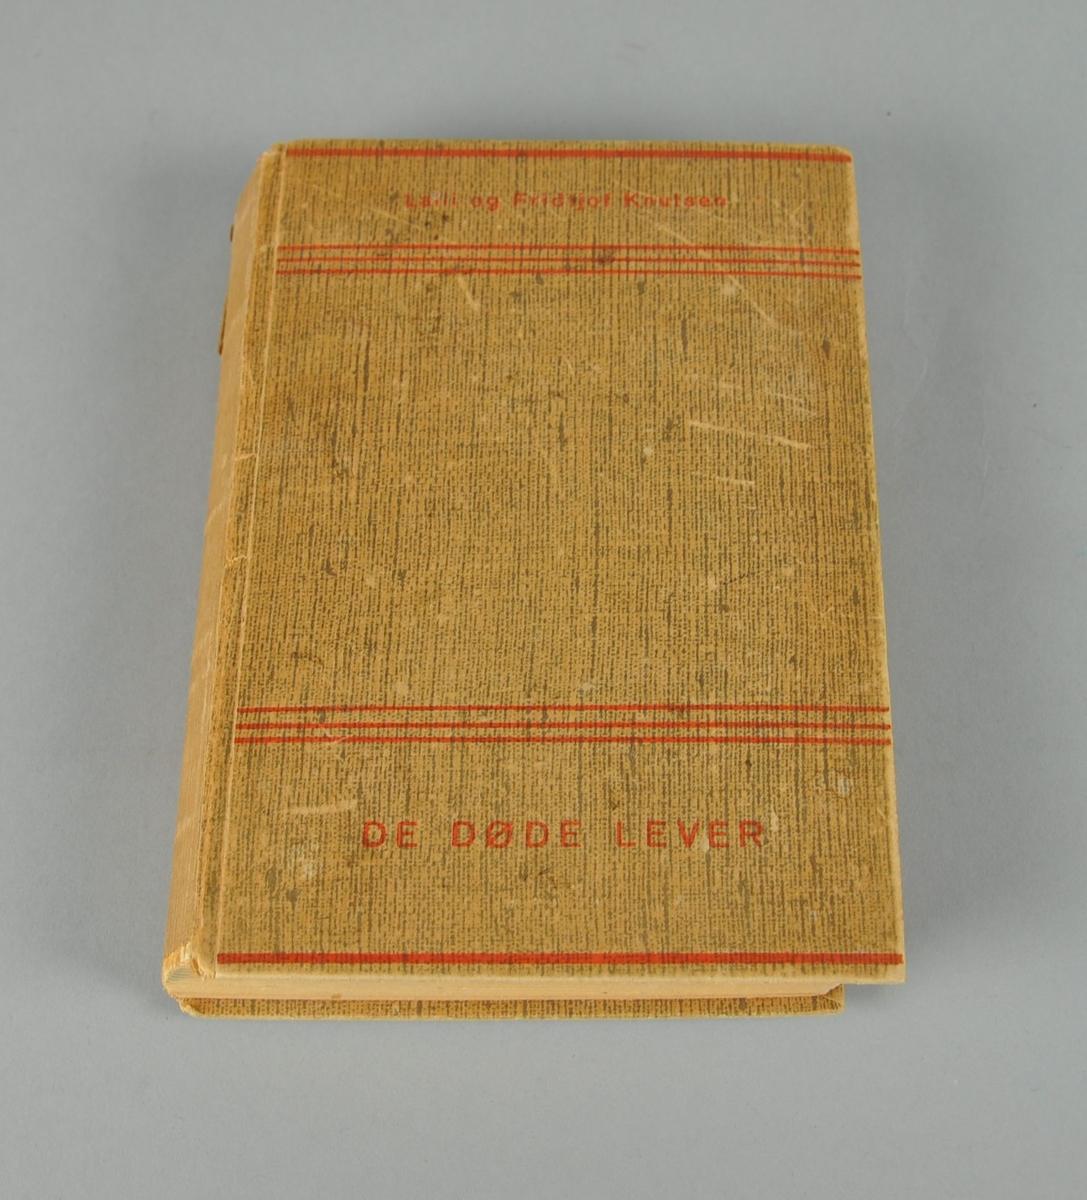 s. 206.